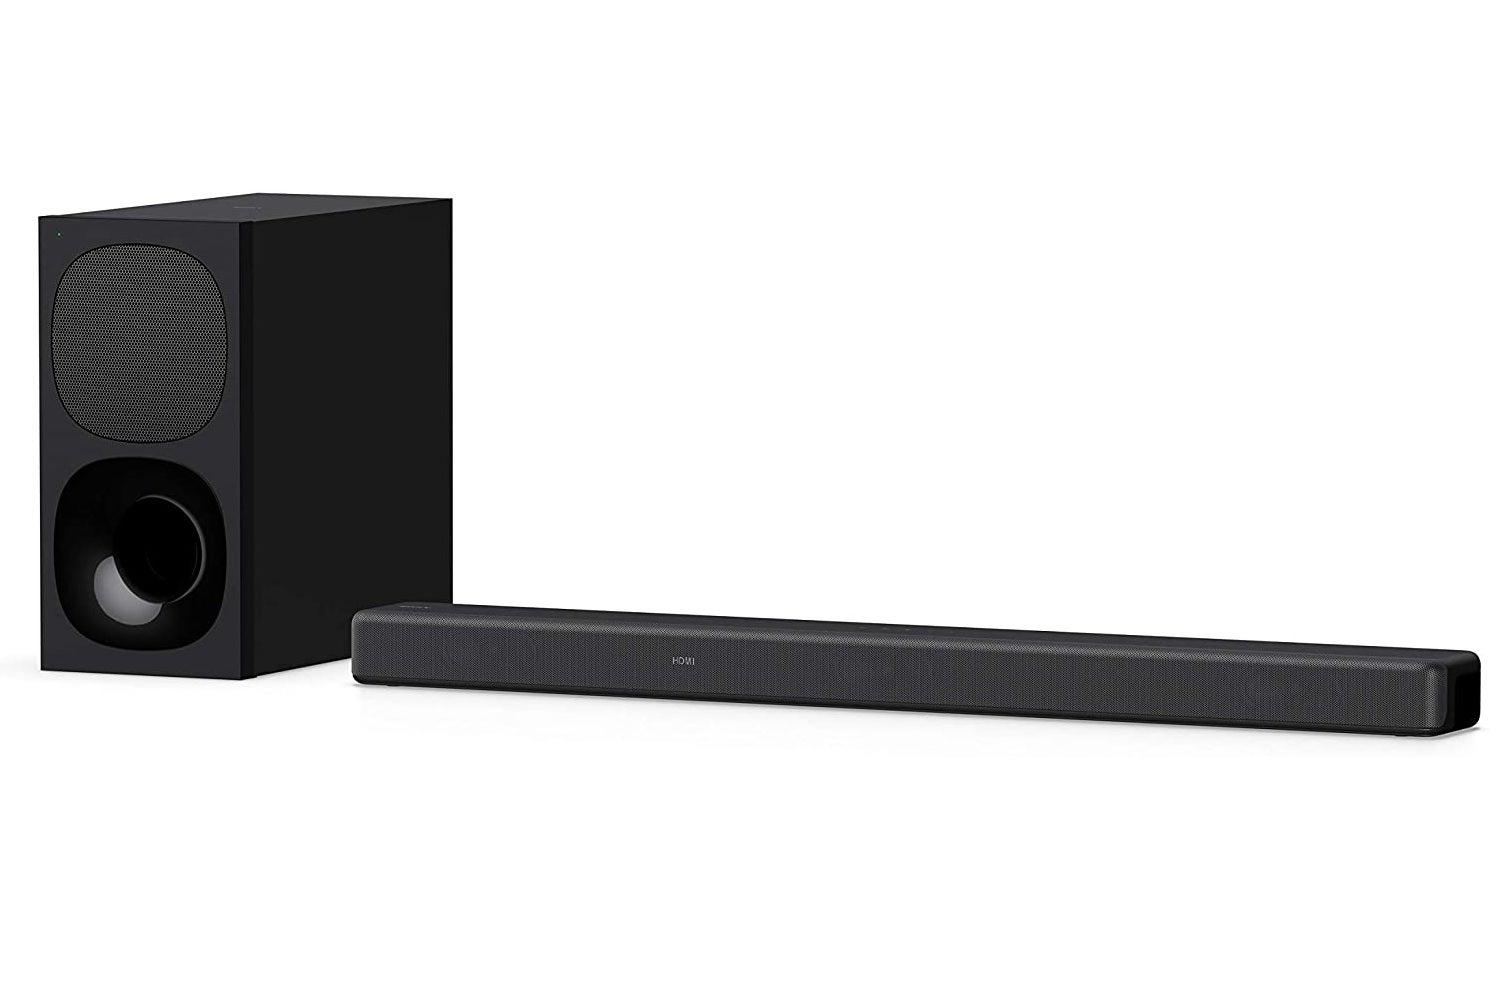 Sony HTG700 Soundbar